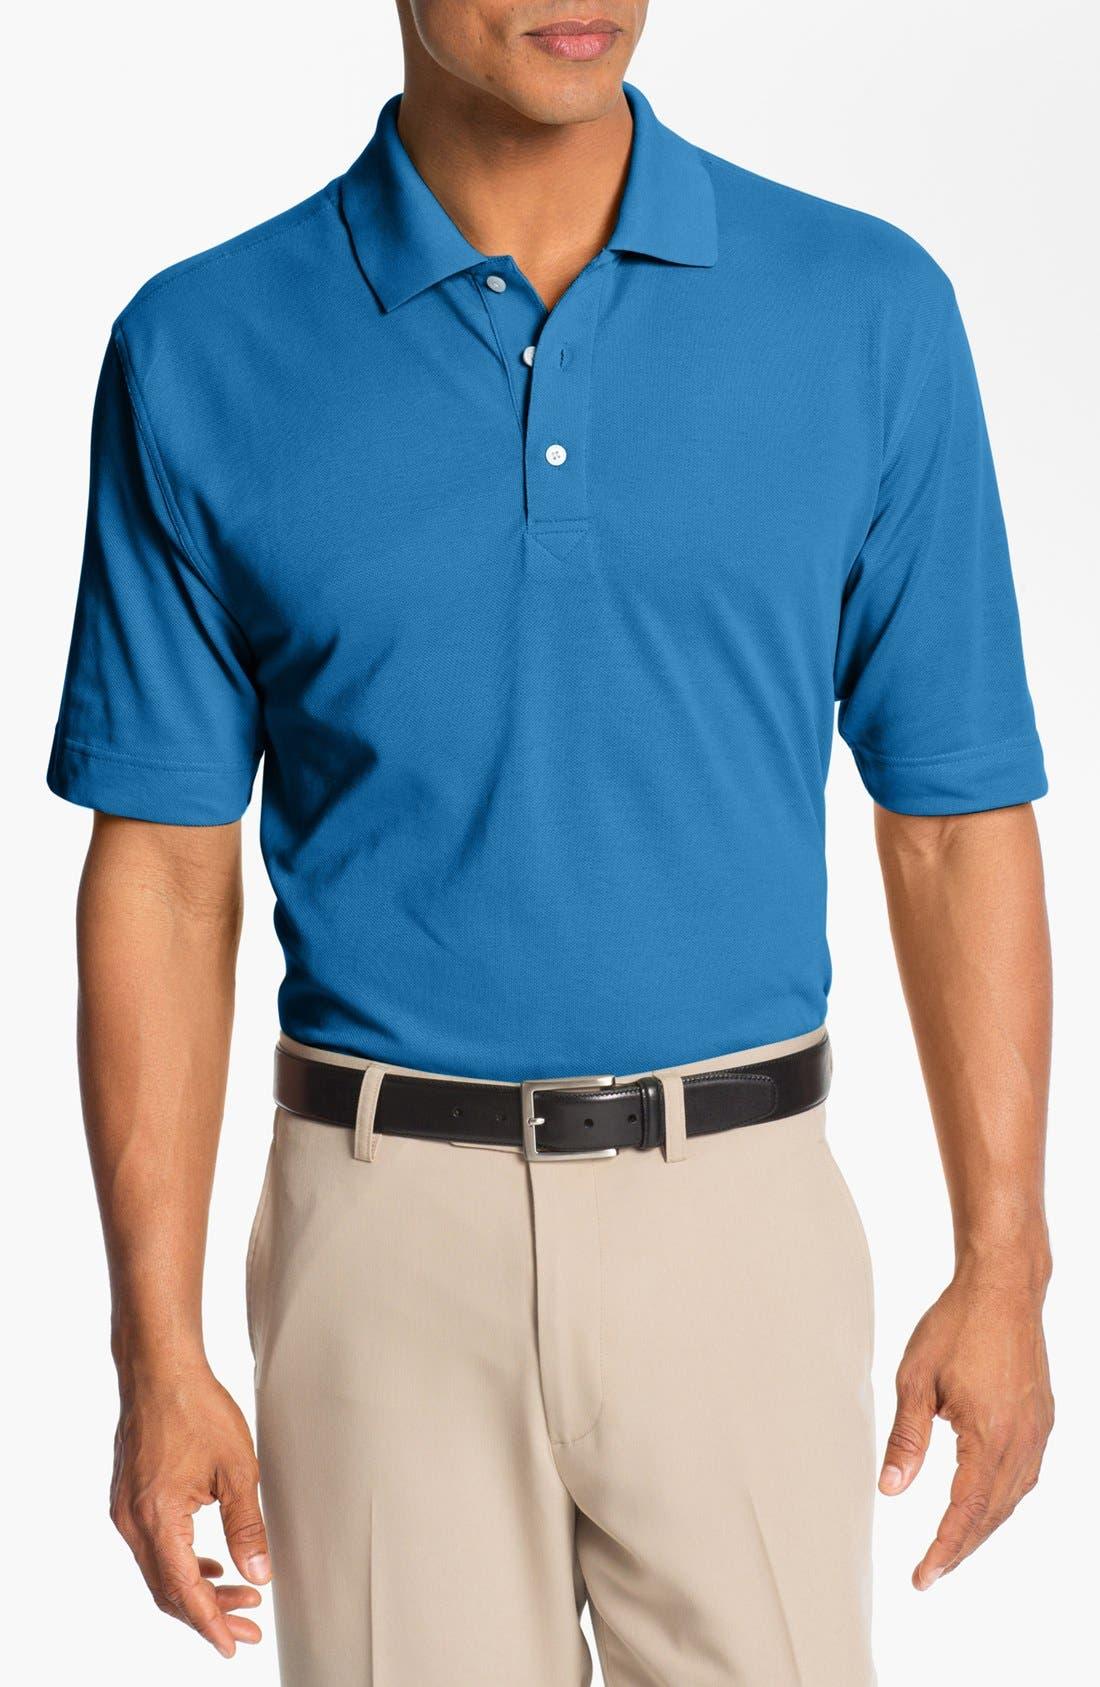 Main Image - Cutter & Buck Championship DryTec Golf Polo